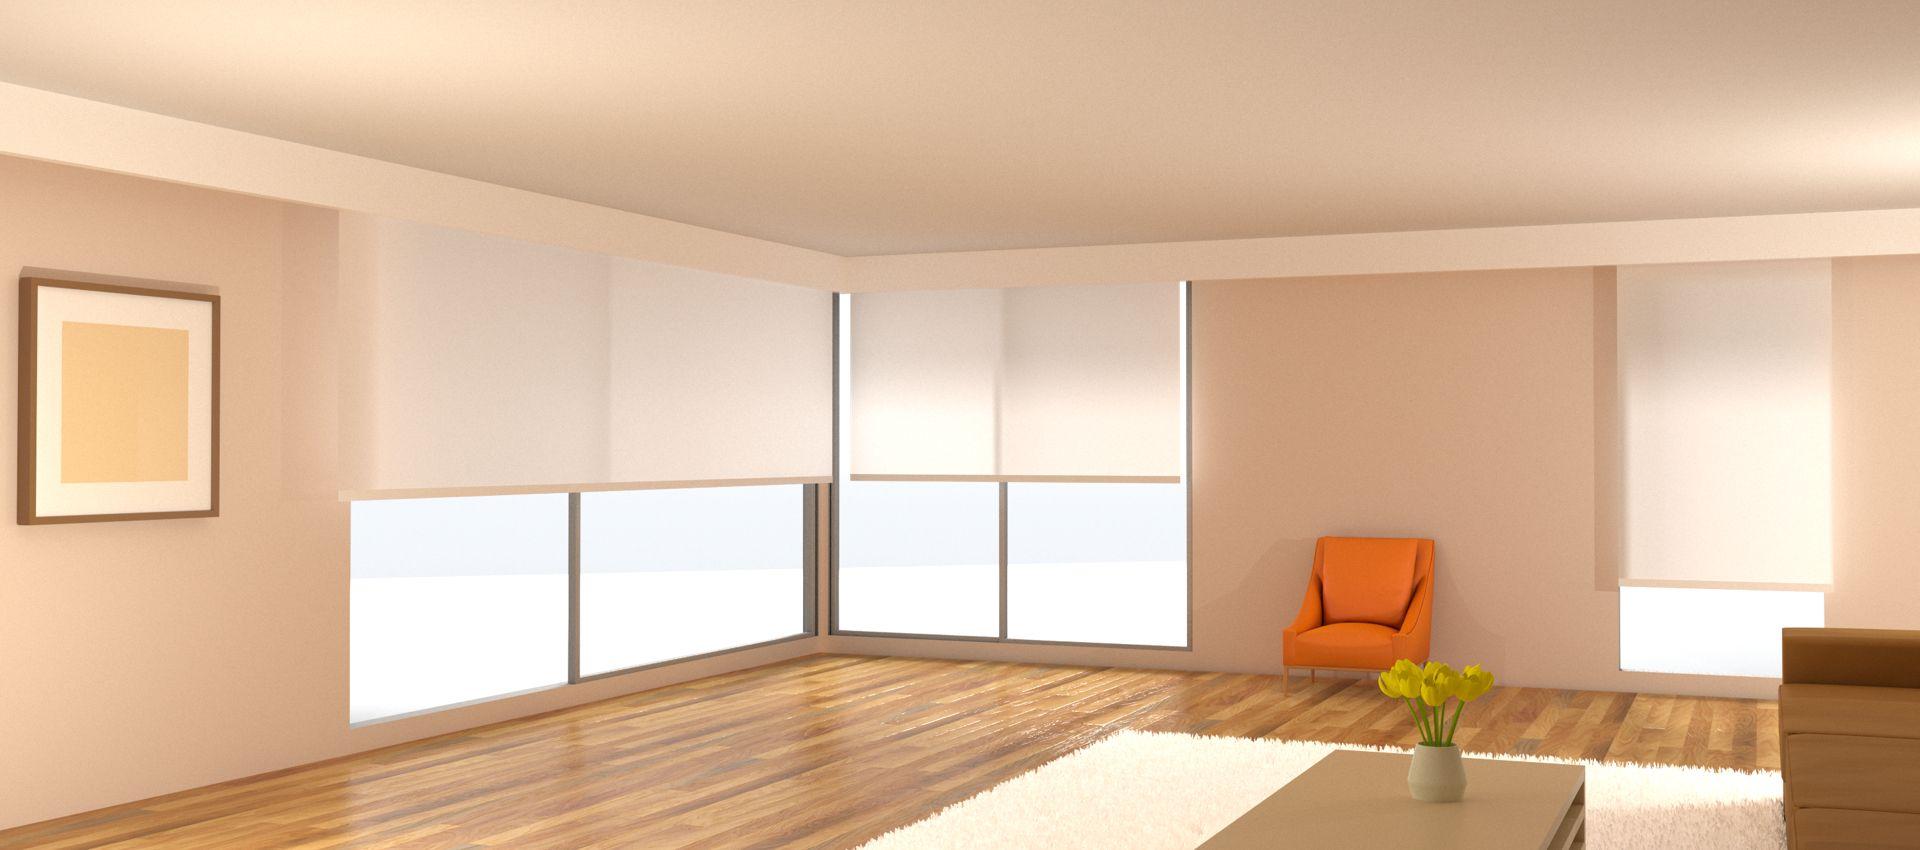 электро-рулонные шторы светлые